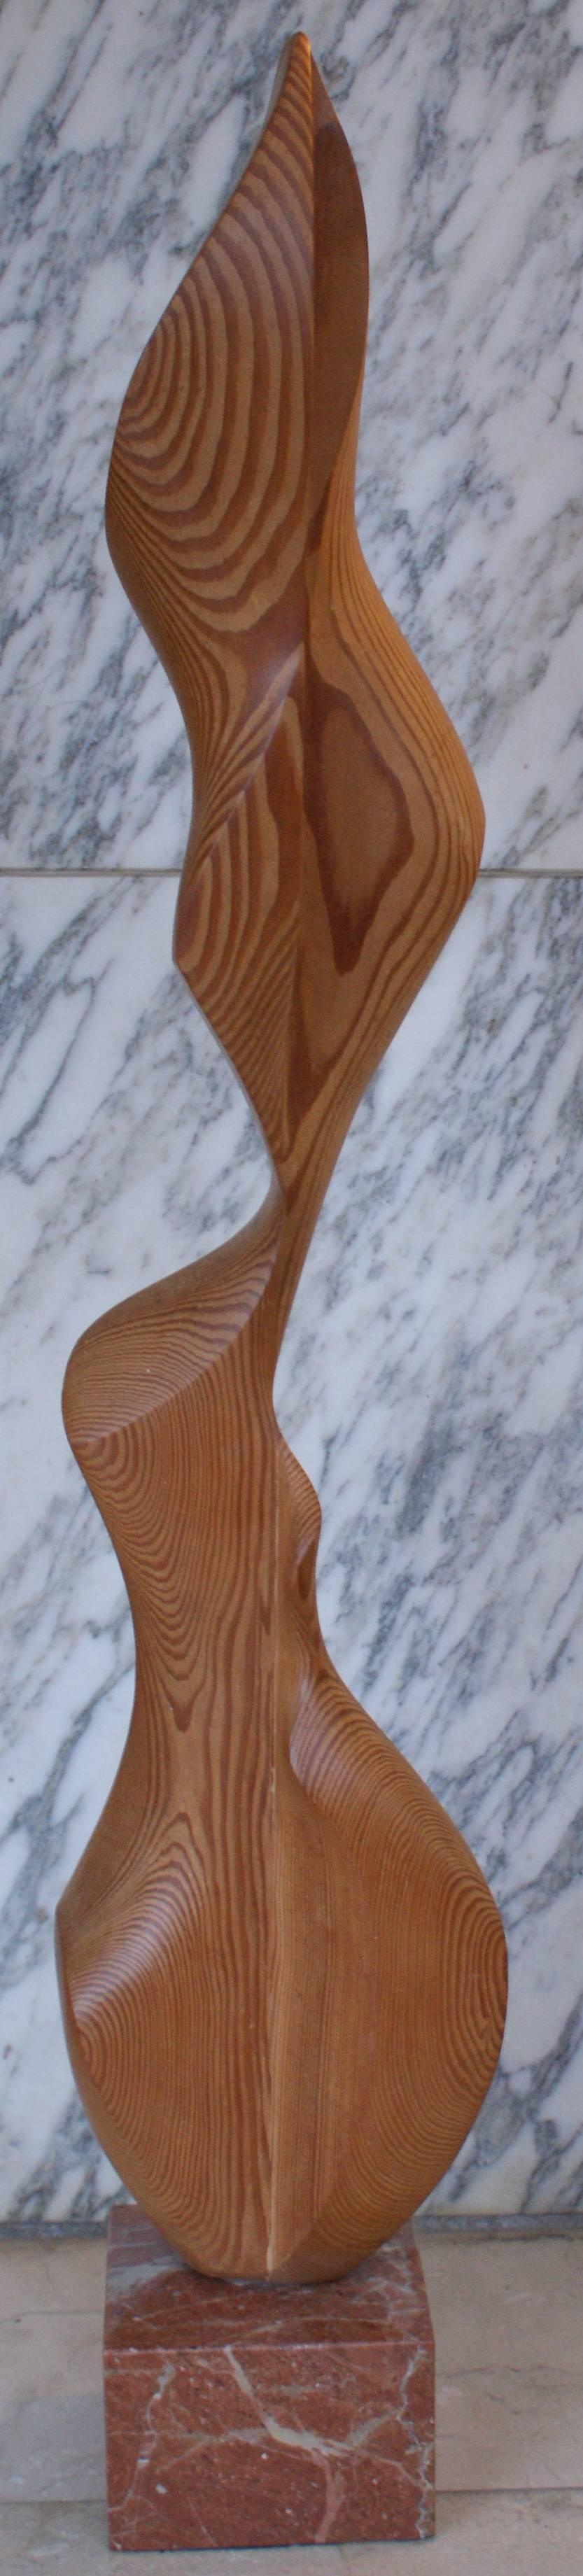 WOMAN- original wood sculpture